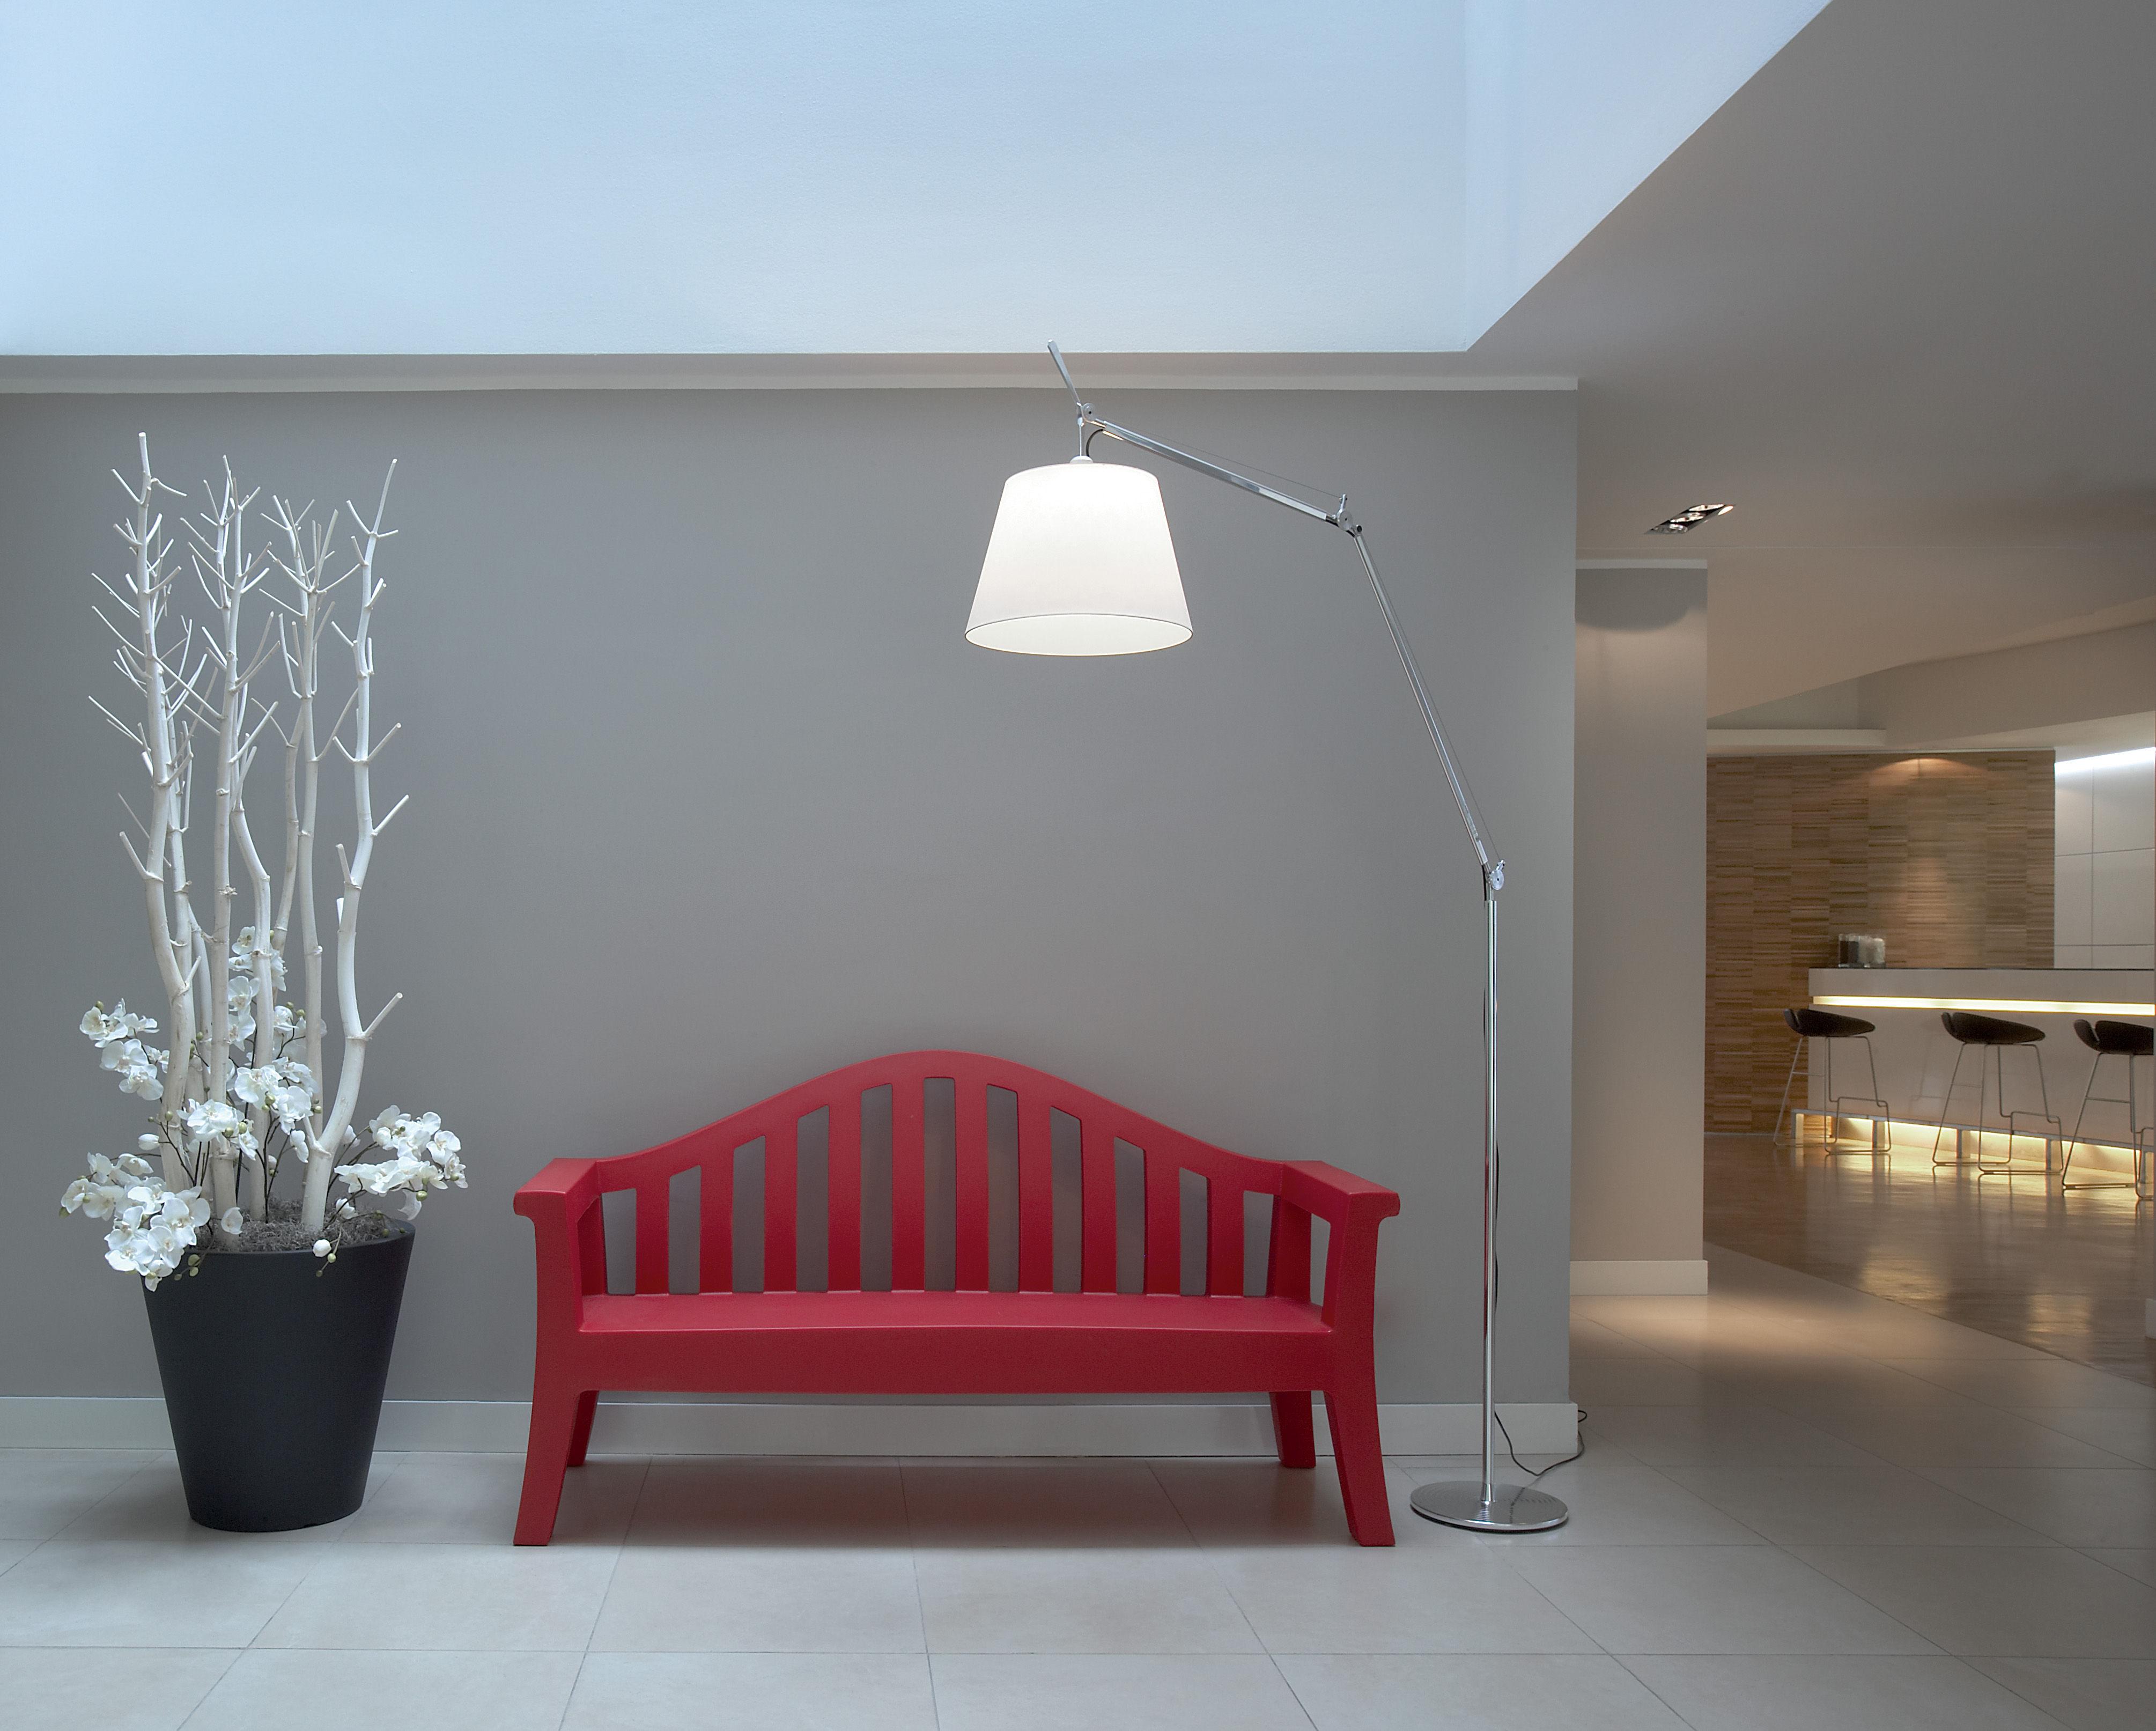 Tolomeo mega floor lamp h 148 to 327 cm diffuser 36 cm for Mega floor